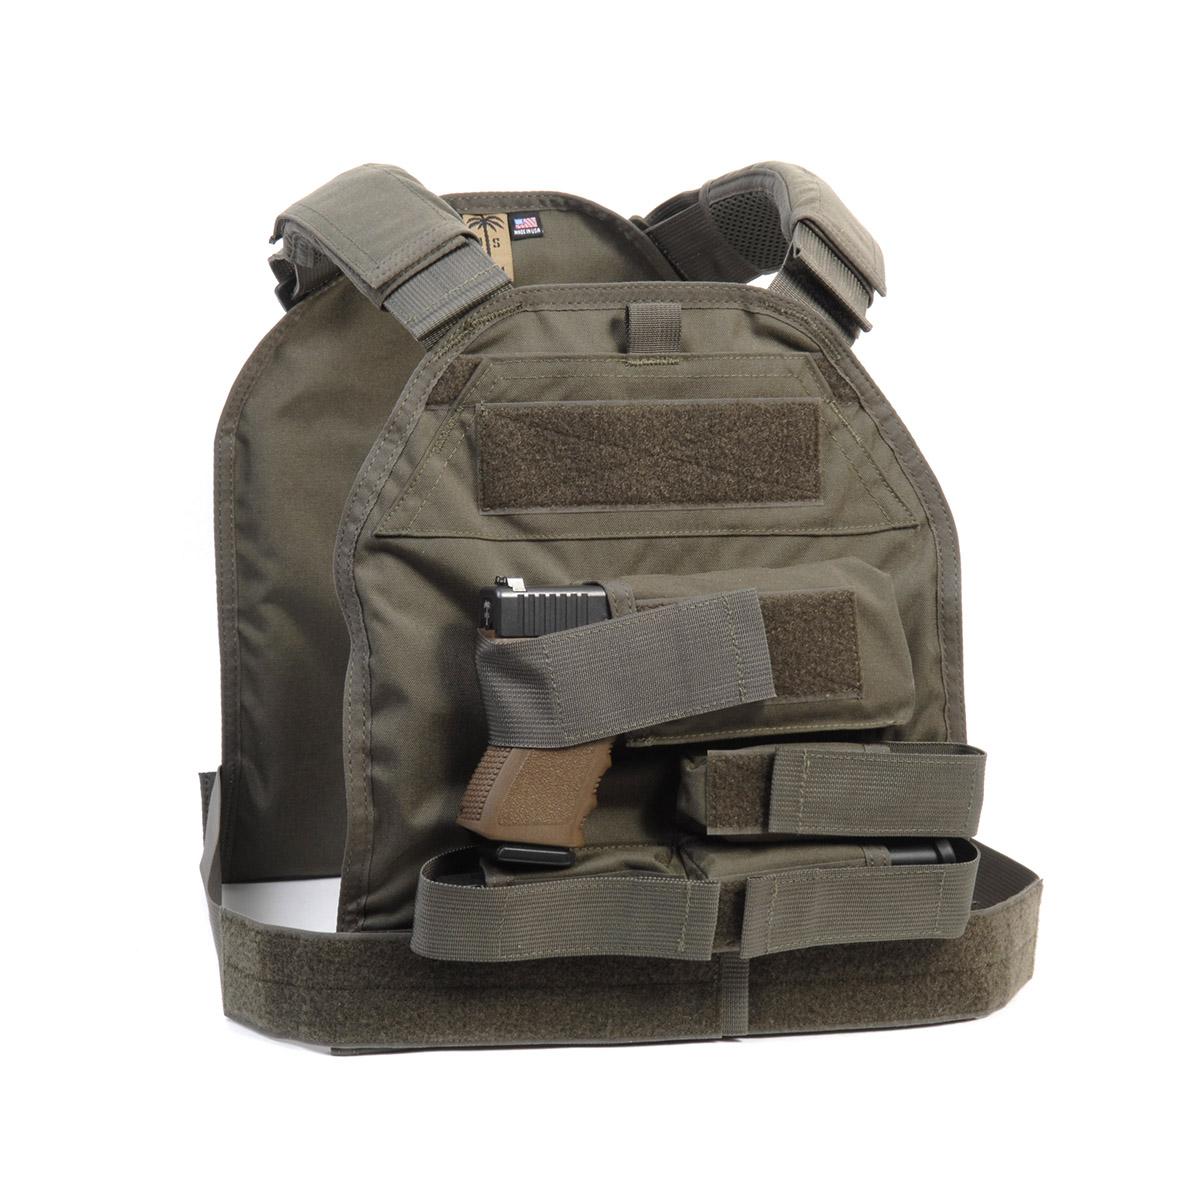 US P.A.L.M. Defender Handgun